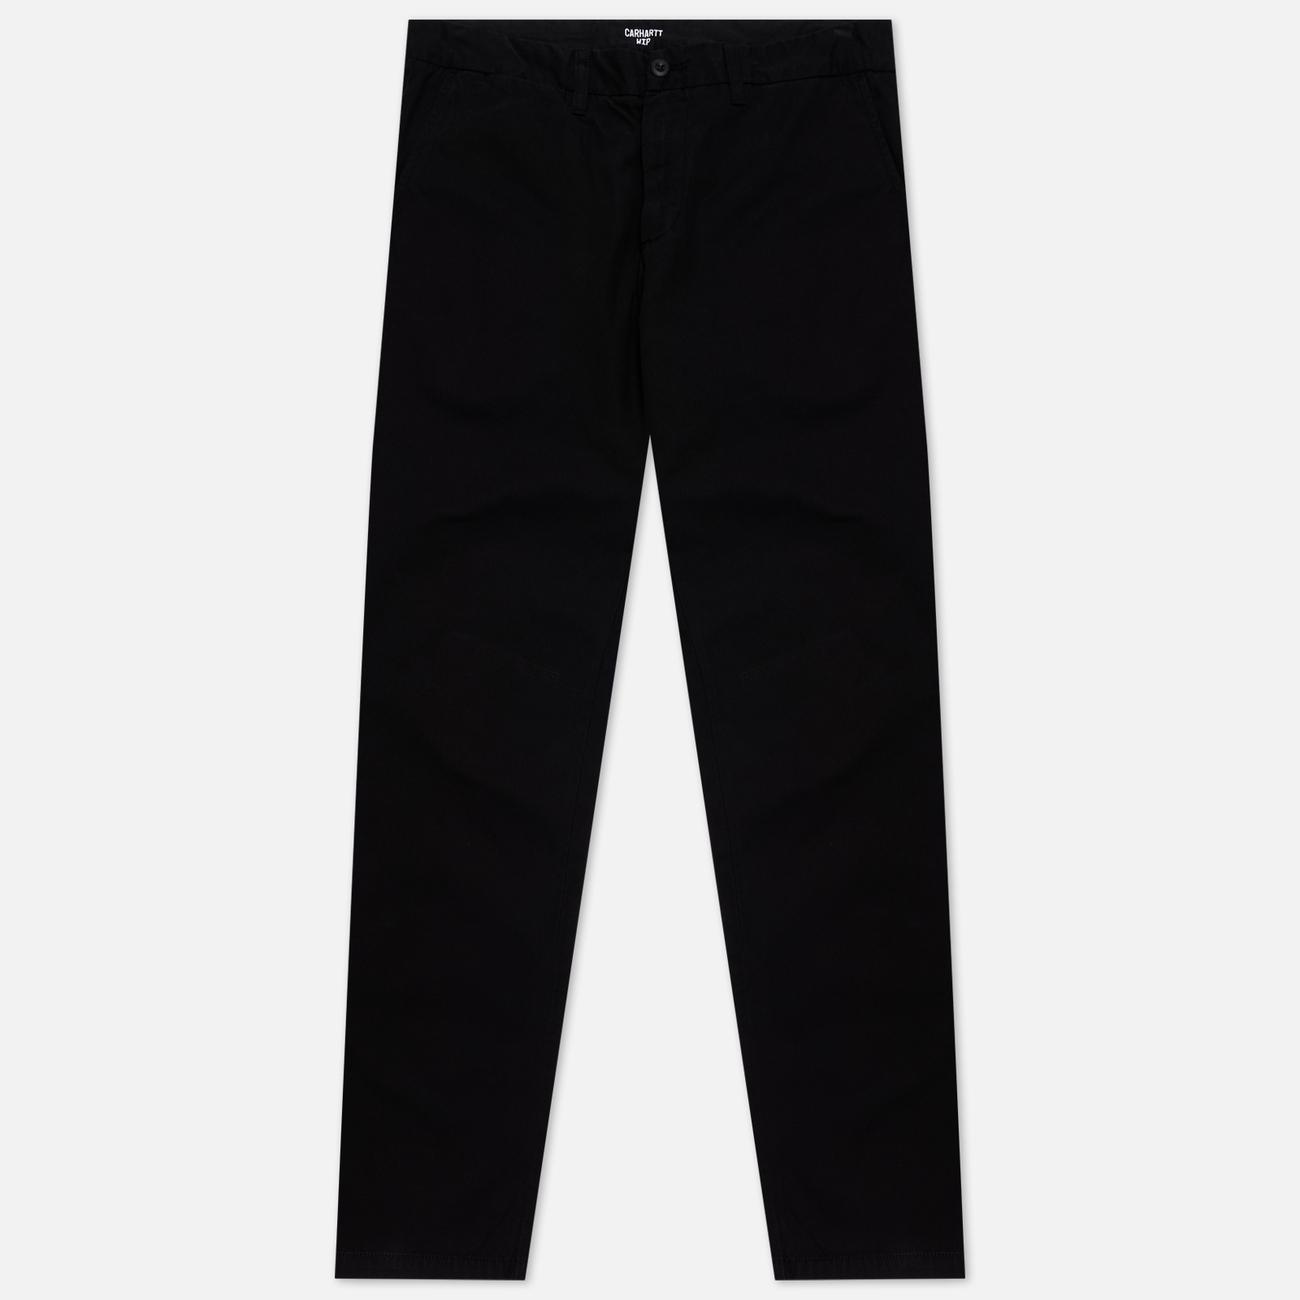 Мужские брюки Carhartt WIP Johnson Twill 8.4 Oz Black